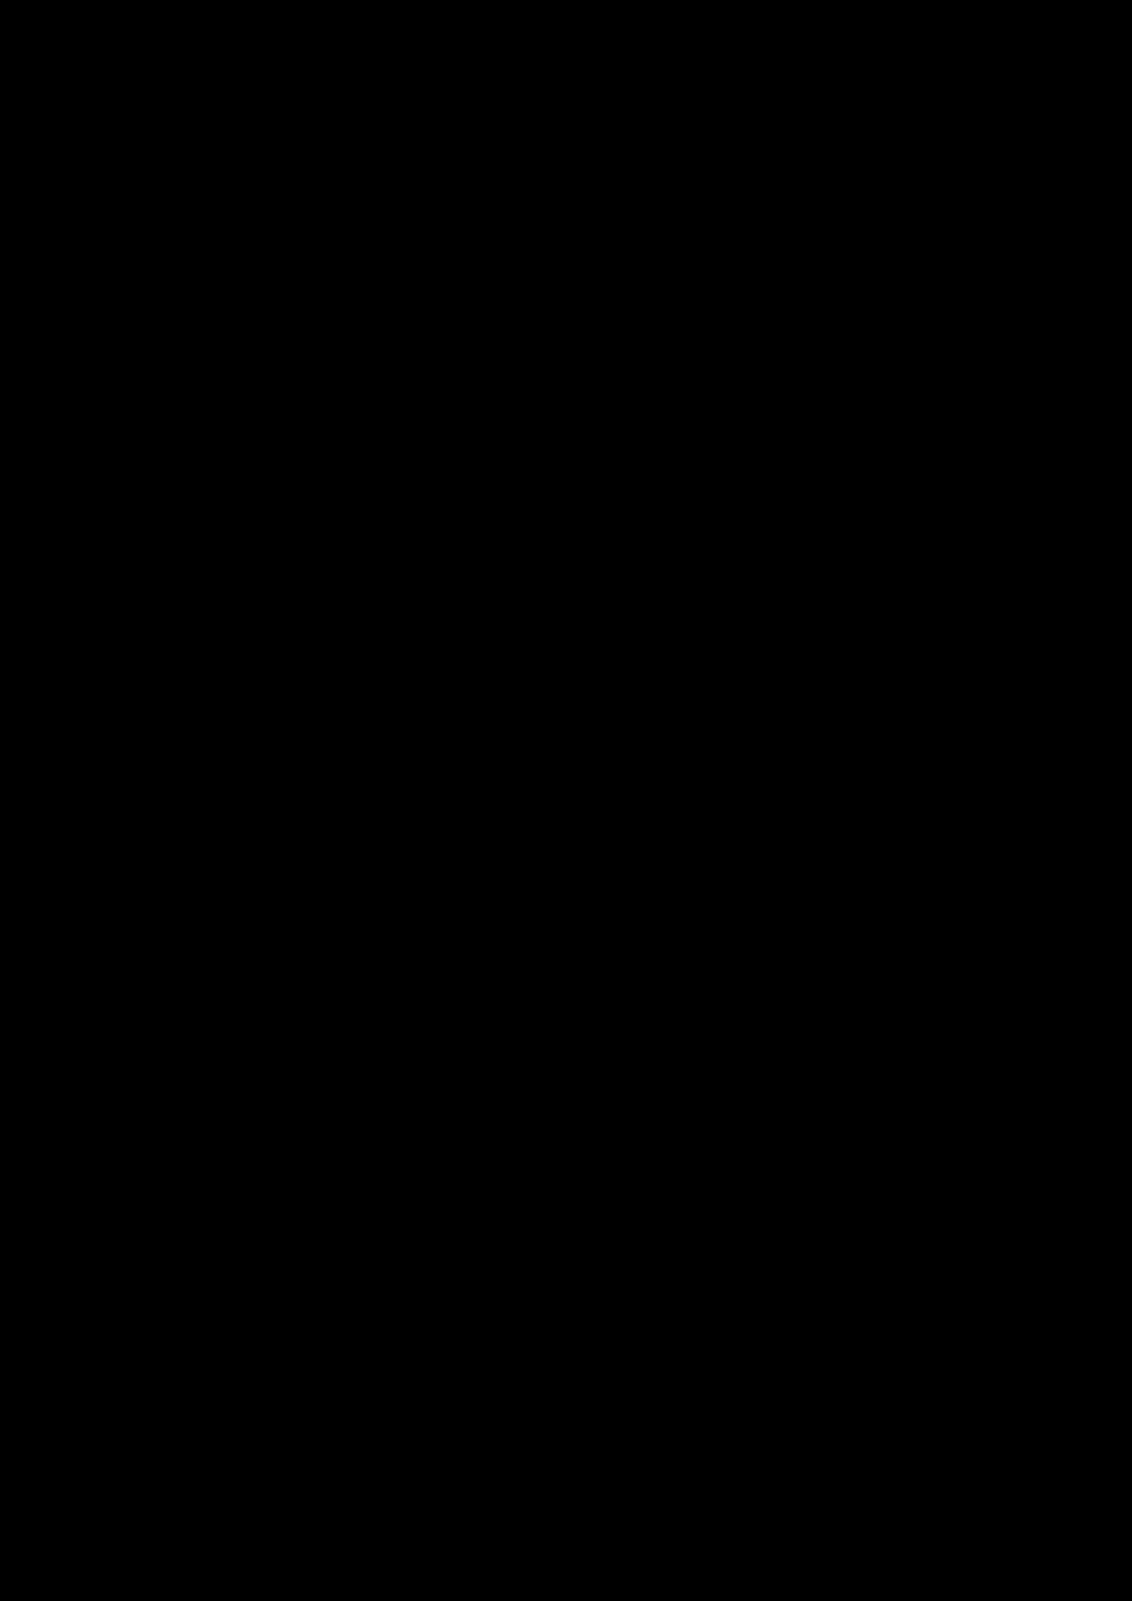 Vremya ne jdet slide, Image 33